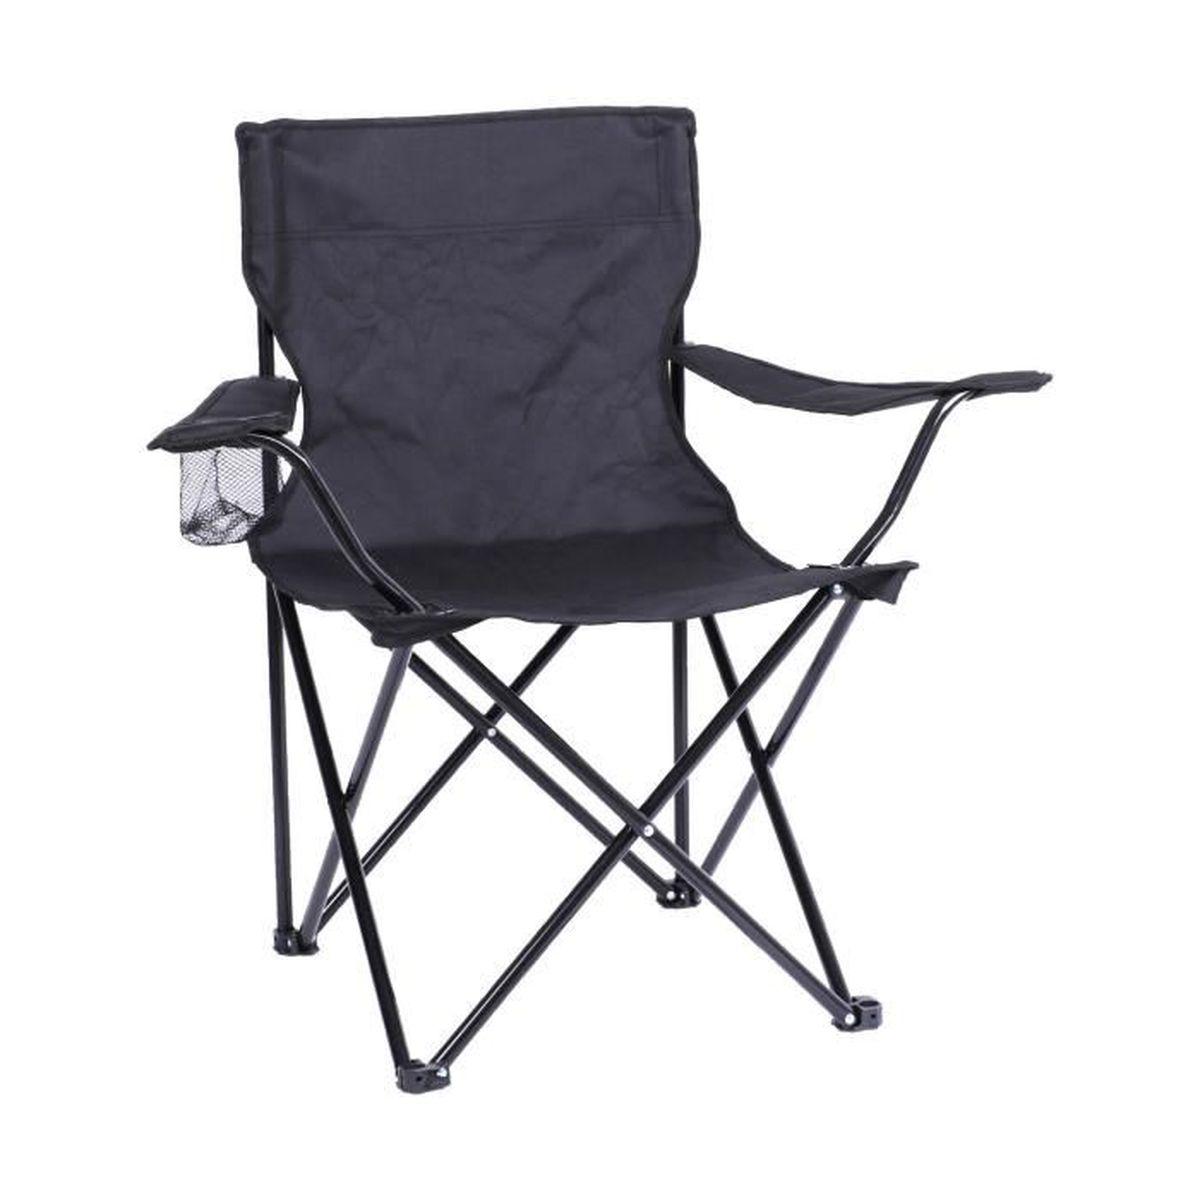 Chaise de camping//chaise pliante Coleman Deck Chair Alu Vert